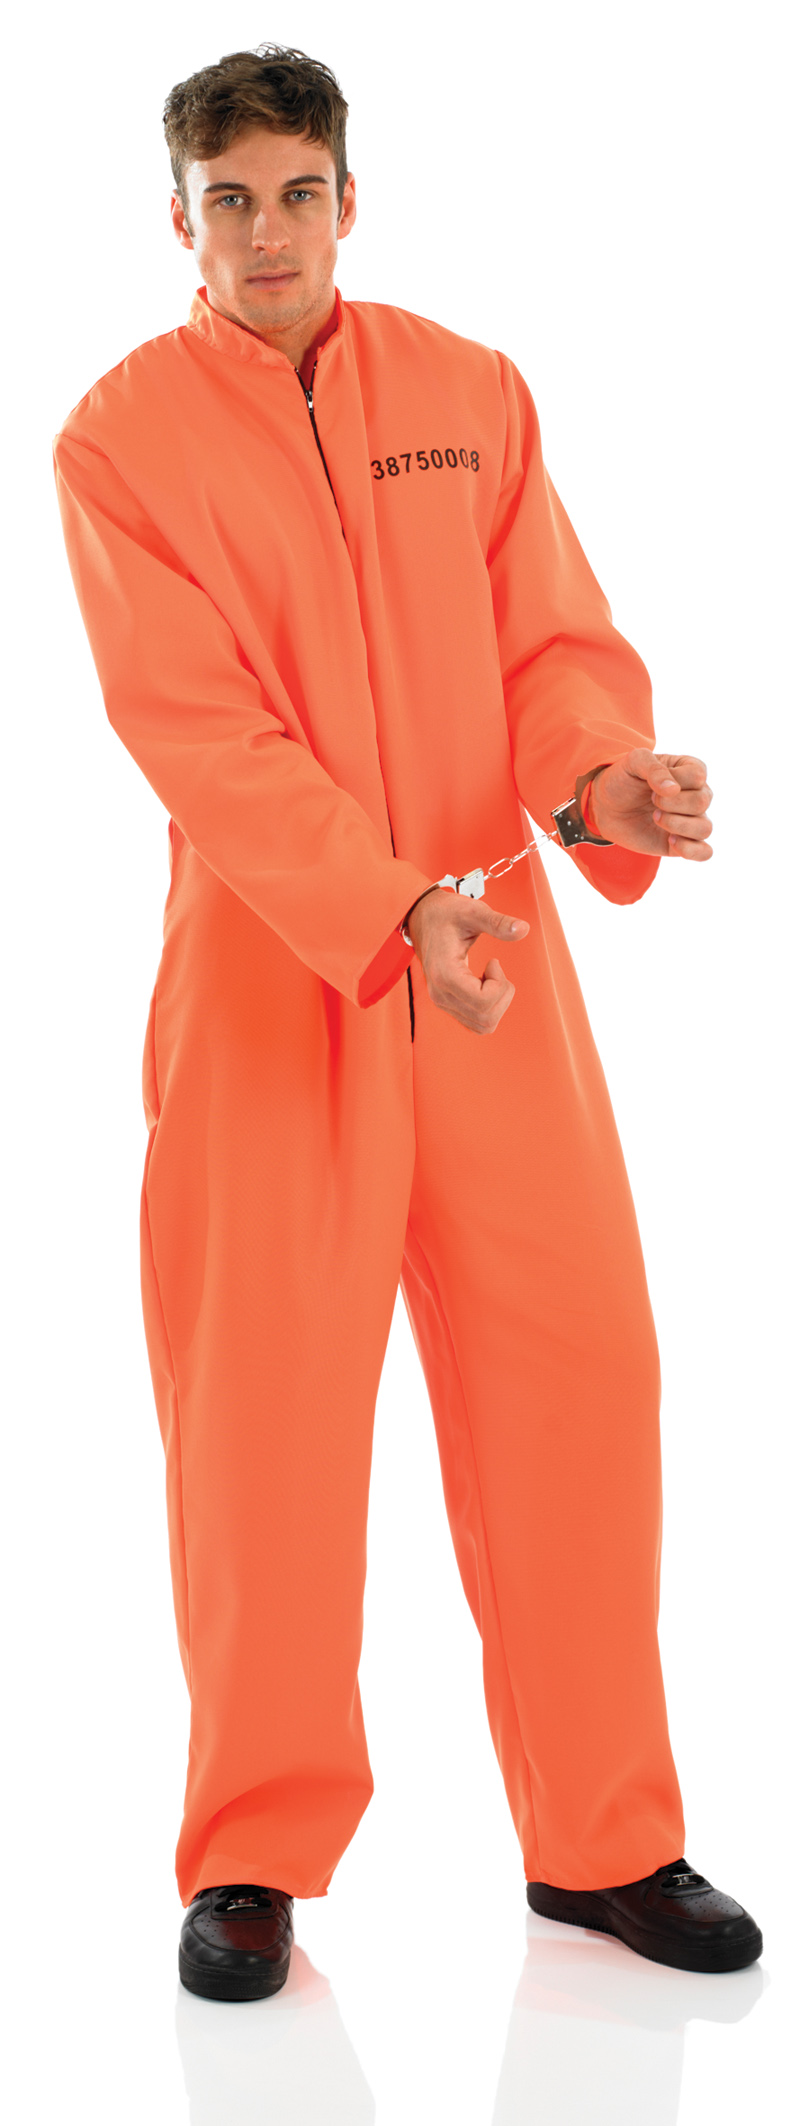 85305bd8ff9a Orange Prison Costume   Adults-Classic-Orange-Prisoner-Jumpsuit ...